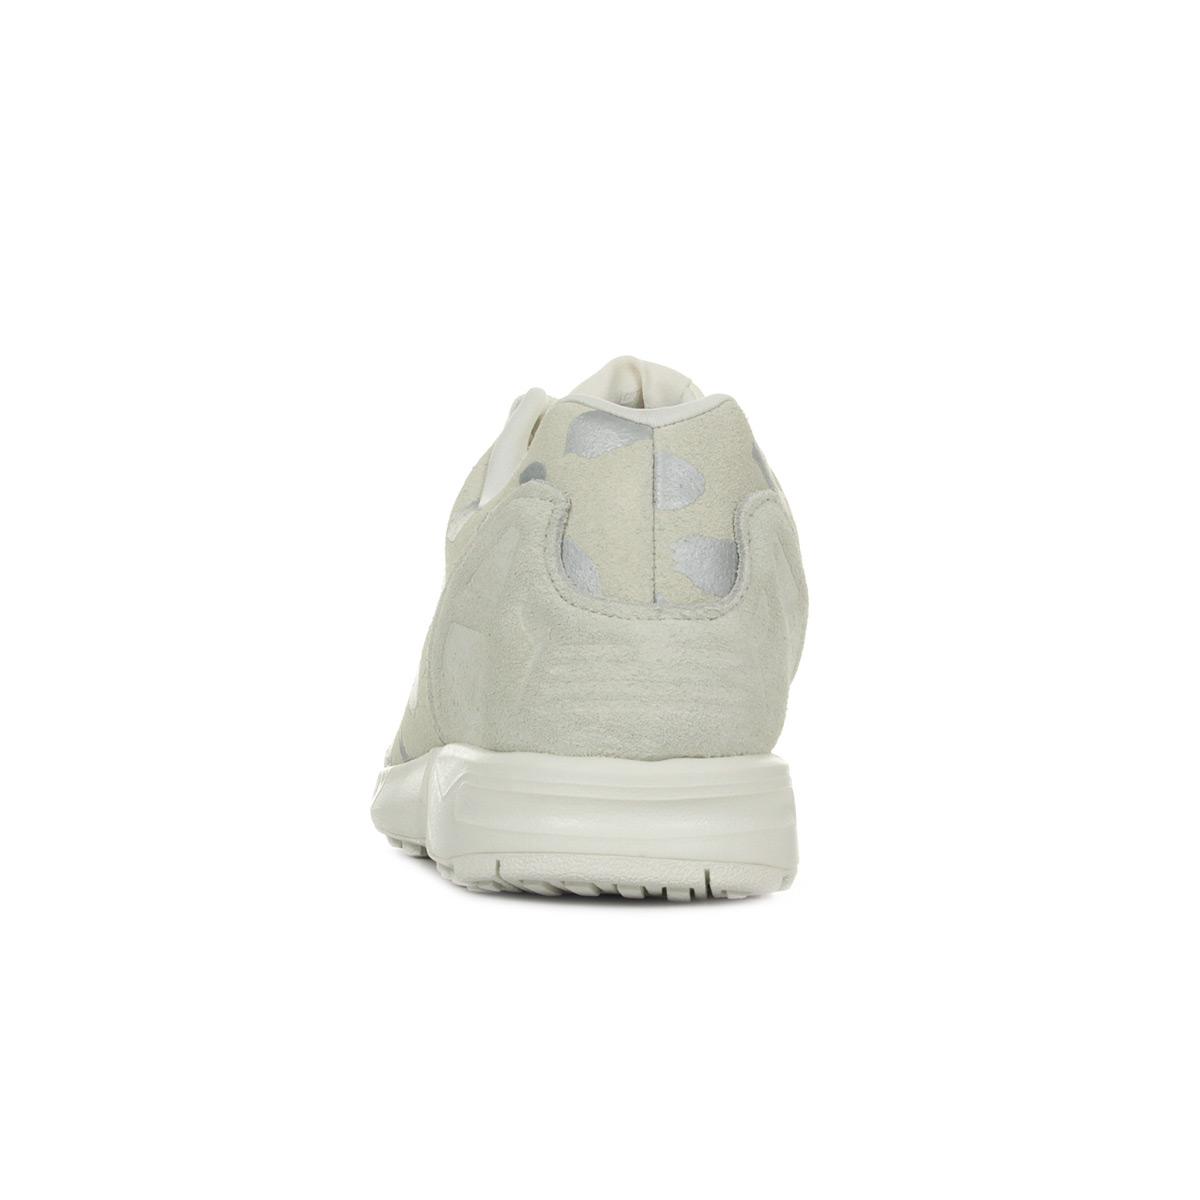 Taille LacetsEbay Zx Chaussures Femme Cuir Adidas Baskets Flux Beige TKJl1Fc3